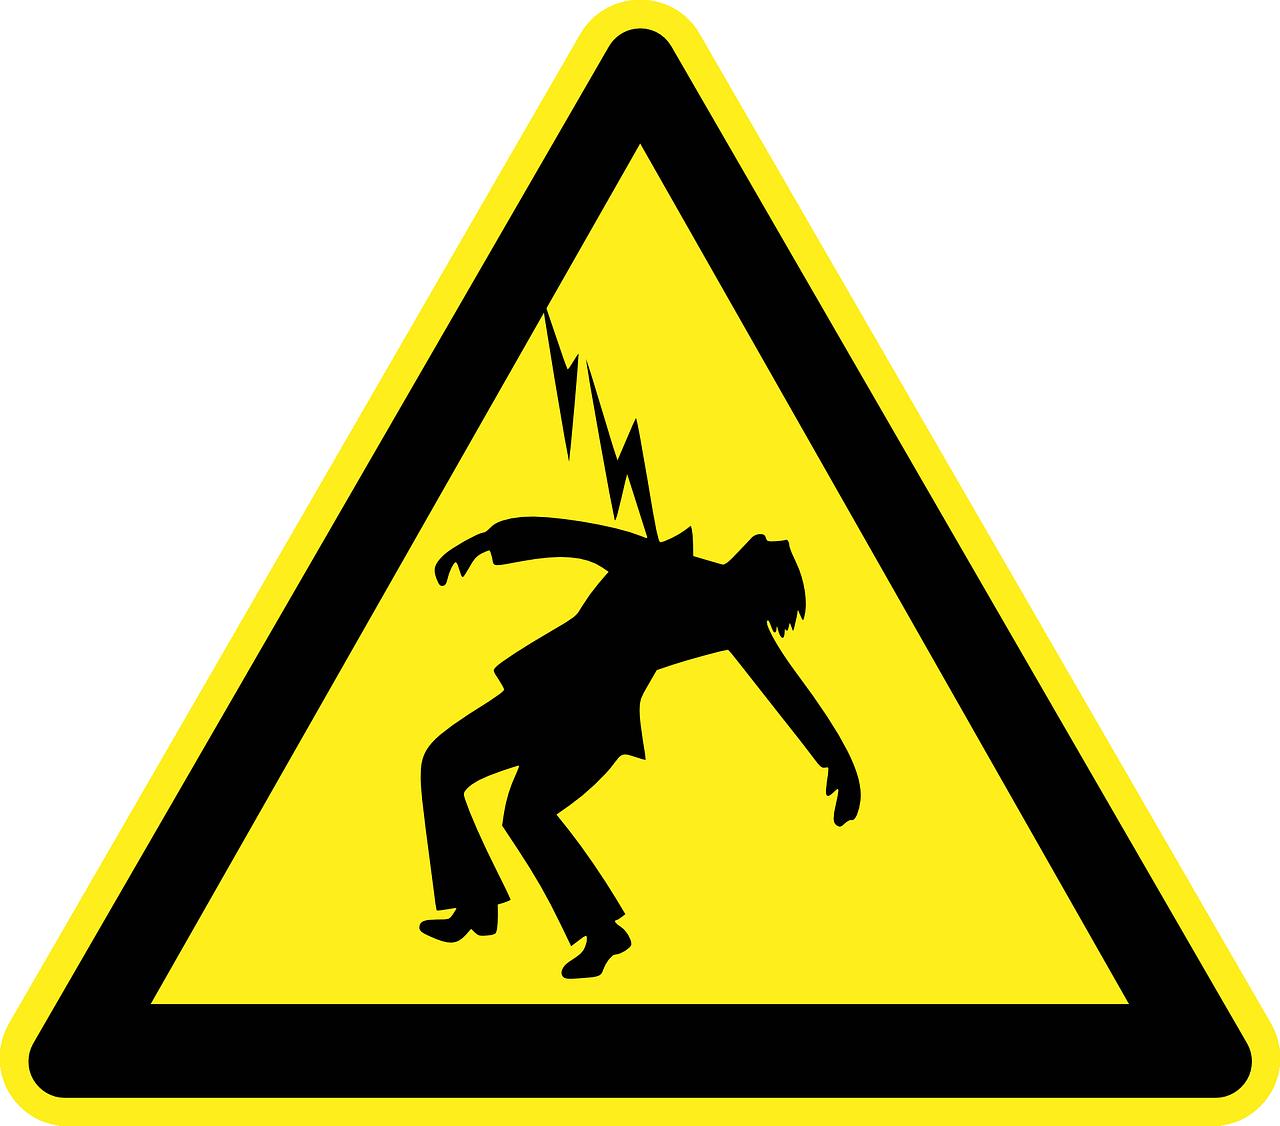 jpg download Rise in Electric Shock Fatalities